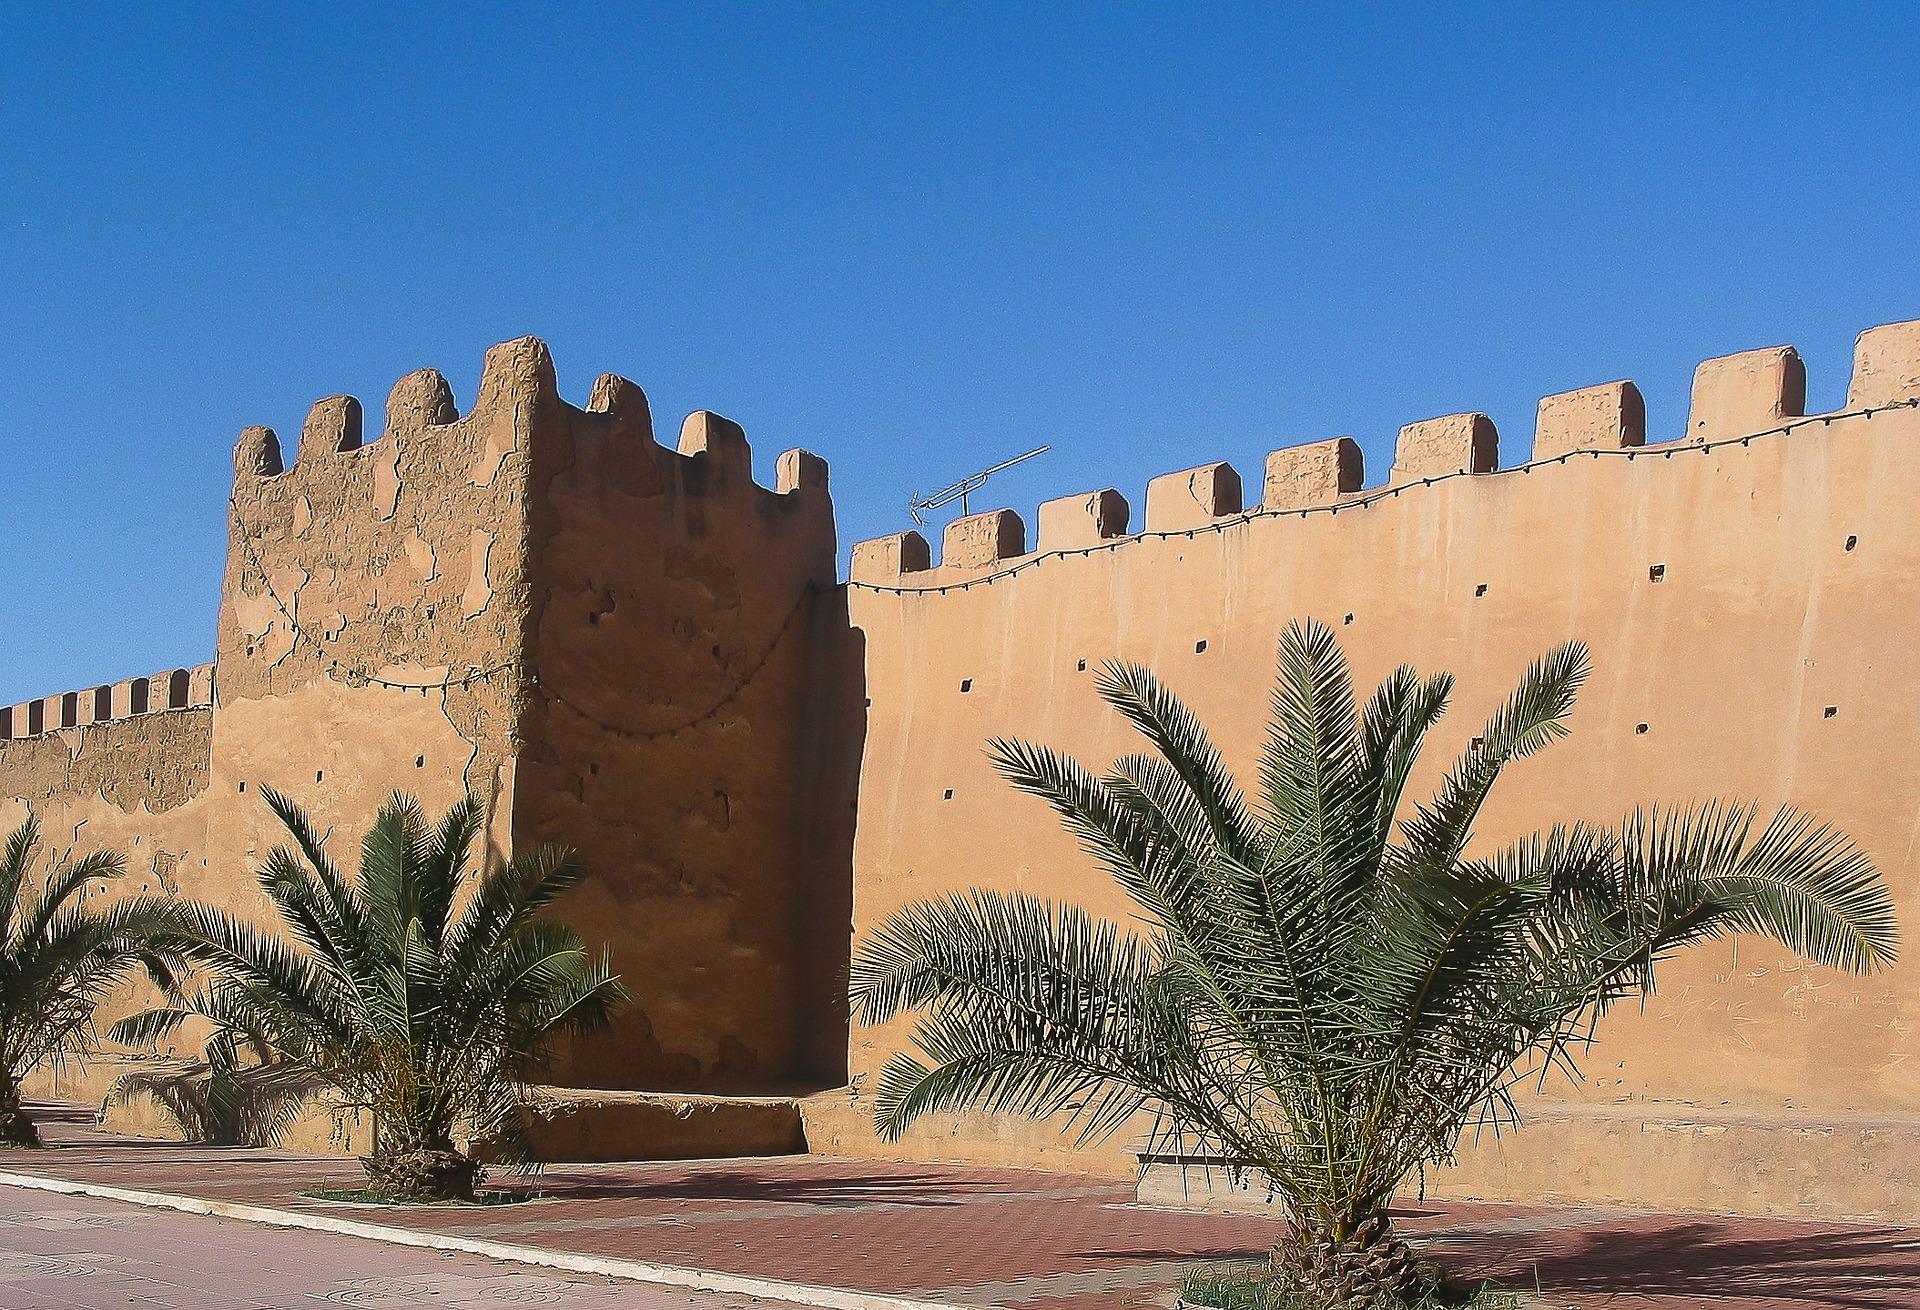 morocco-1327343_1920 (1).jpg